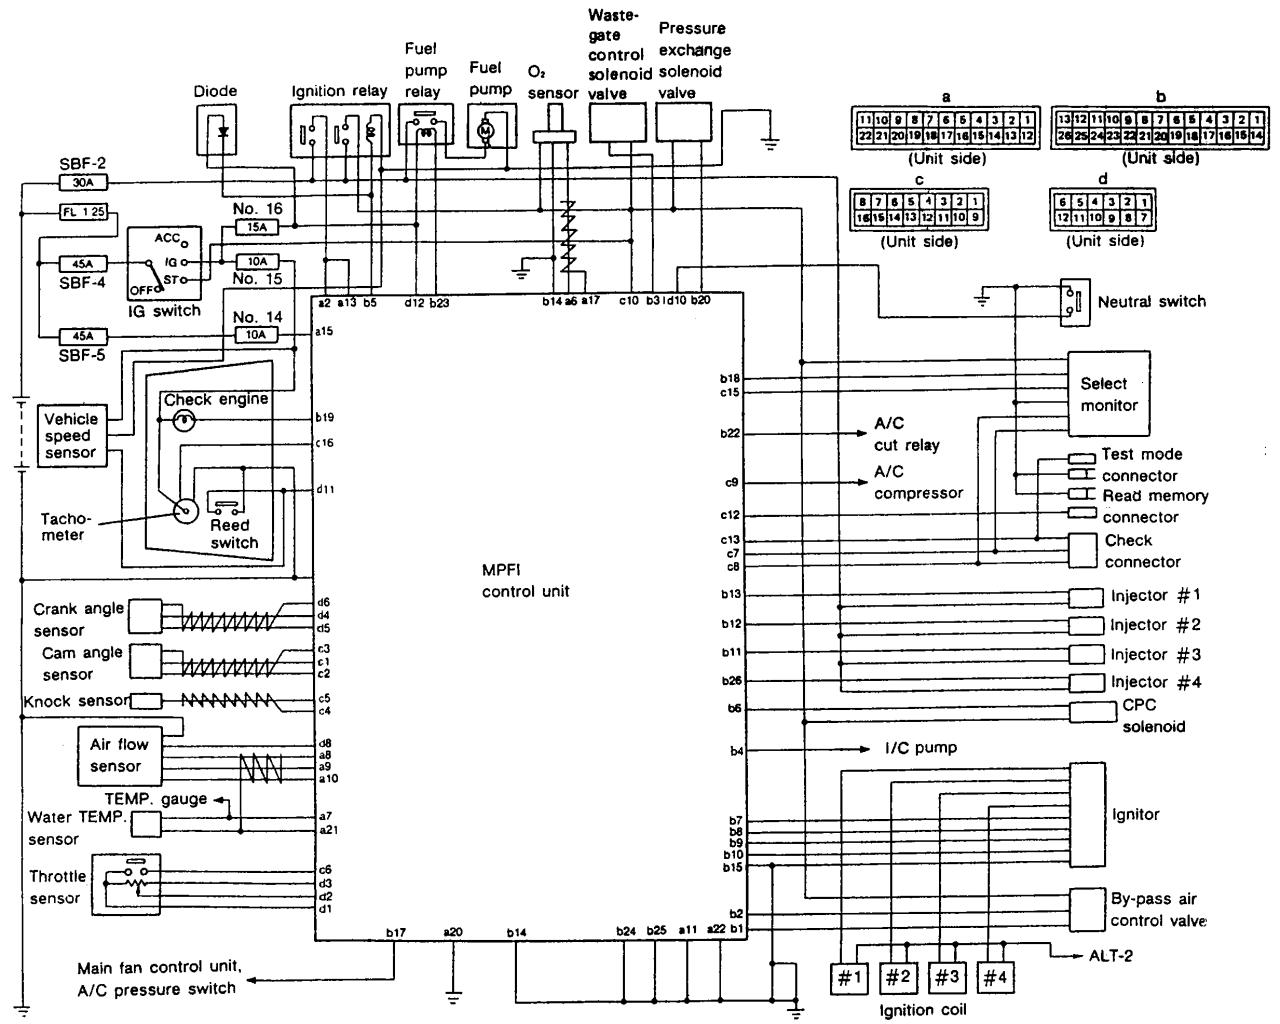 Subaru Outback Ecm Wiring | Wiring Diagram